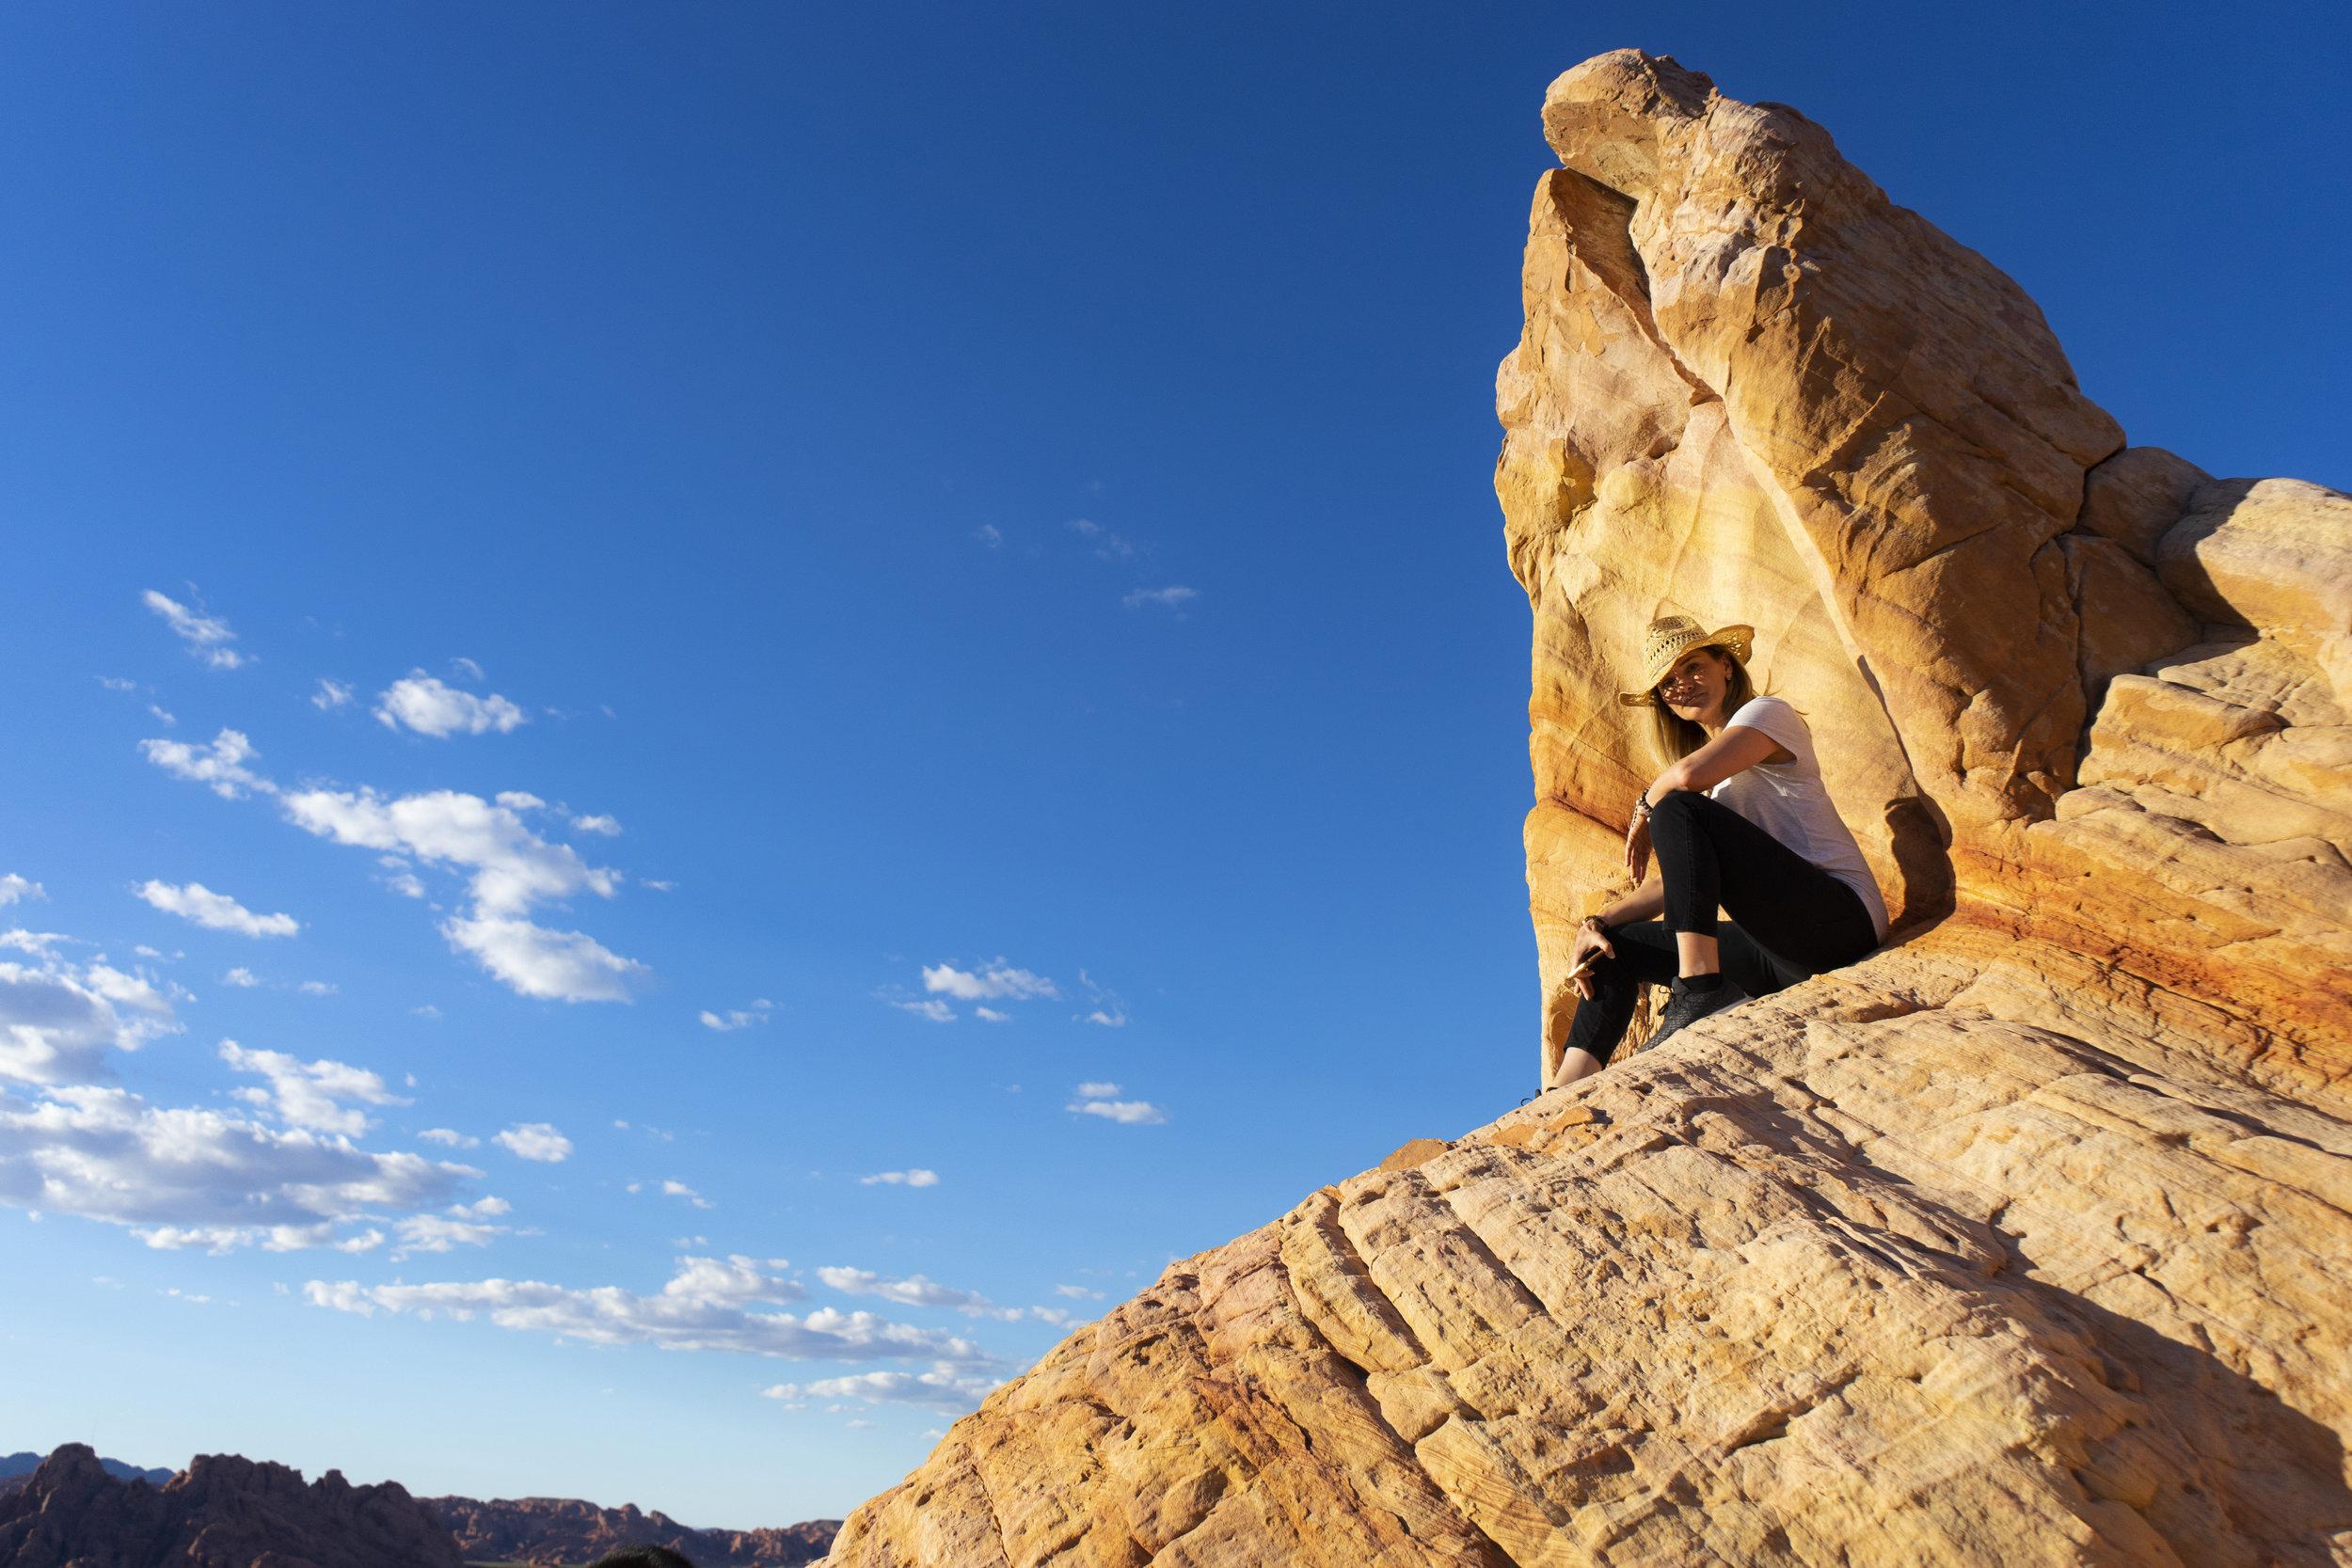 Vanessa Rogers Photographer, Valley of Fire, Las Vegas, Nevada - Credit Roni Fields-Moonen